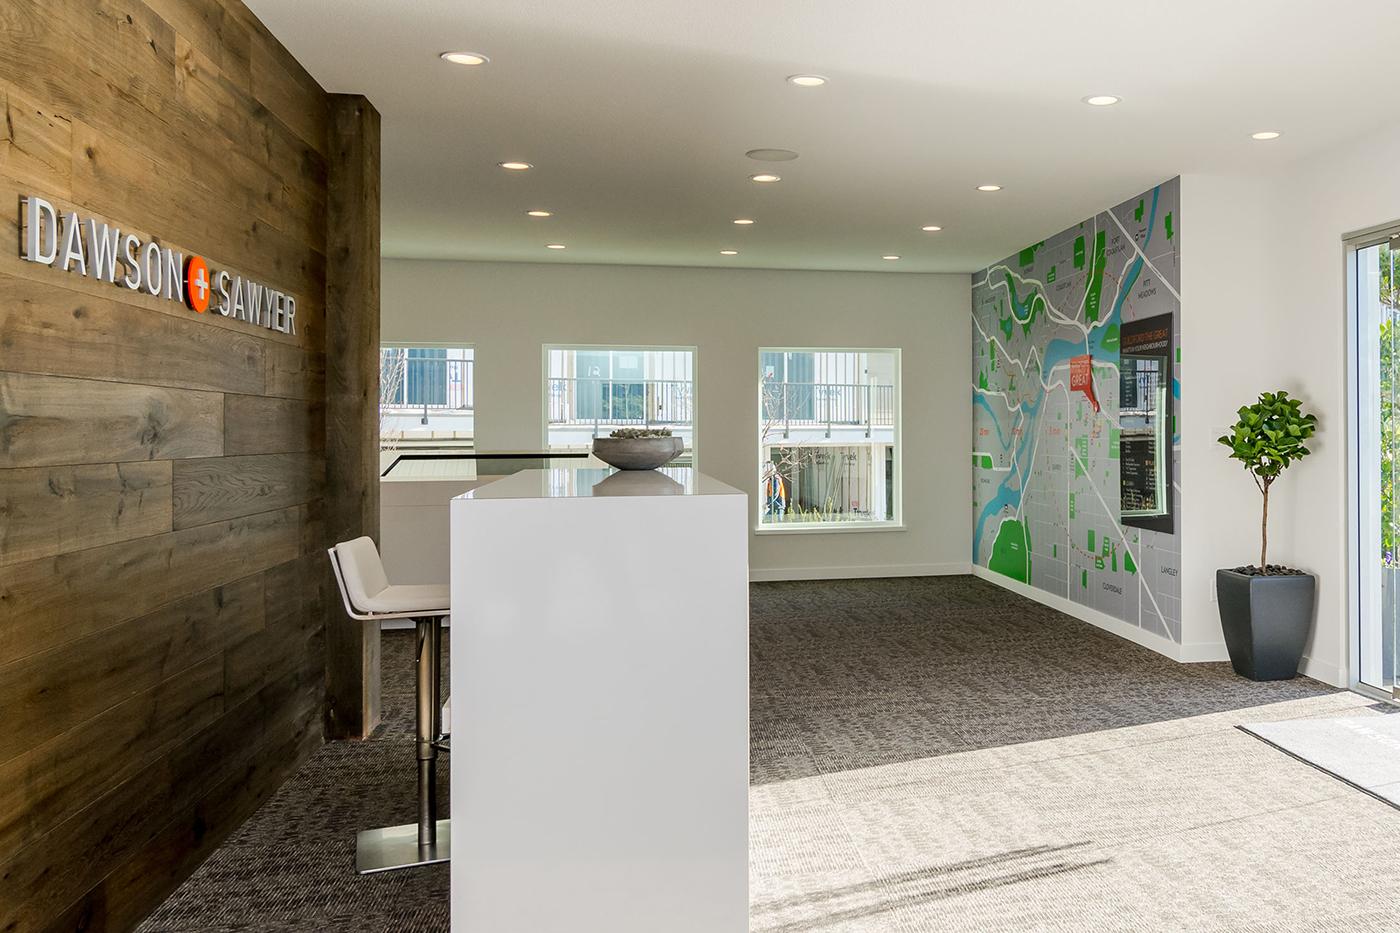 real estate real estate development vancouver surrey Interior Signage exterior signage development